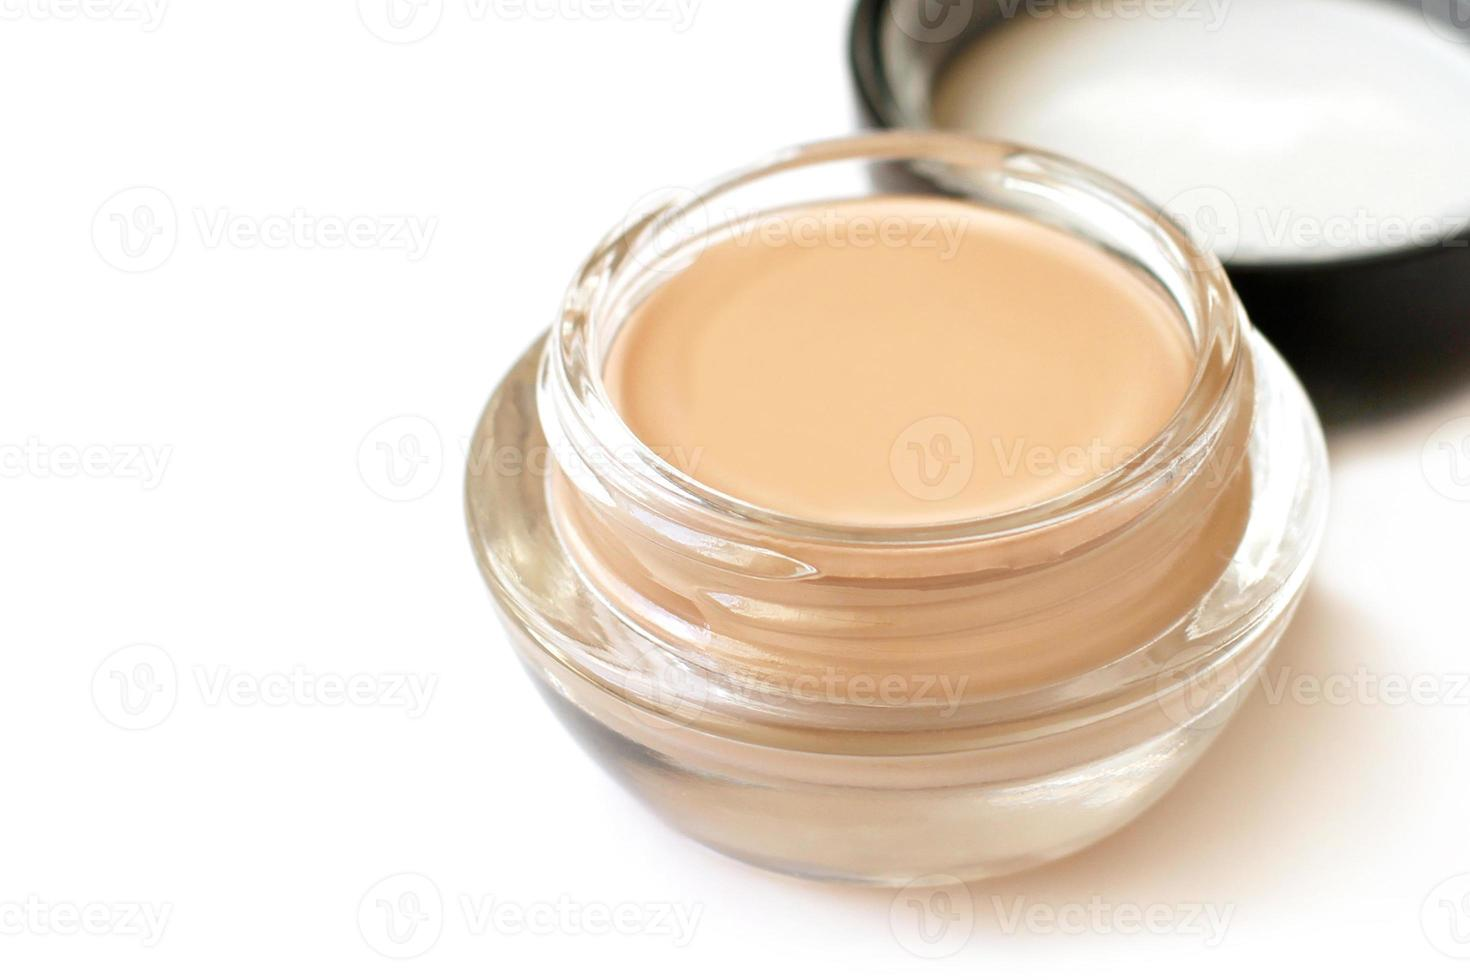 tonale crème in glazen pot op witte achtergrond foto